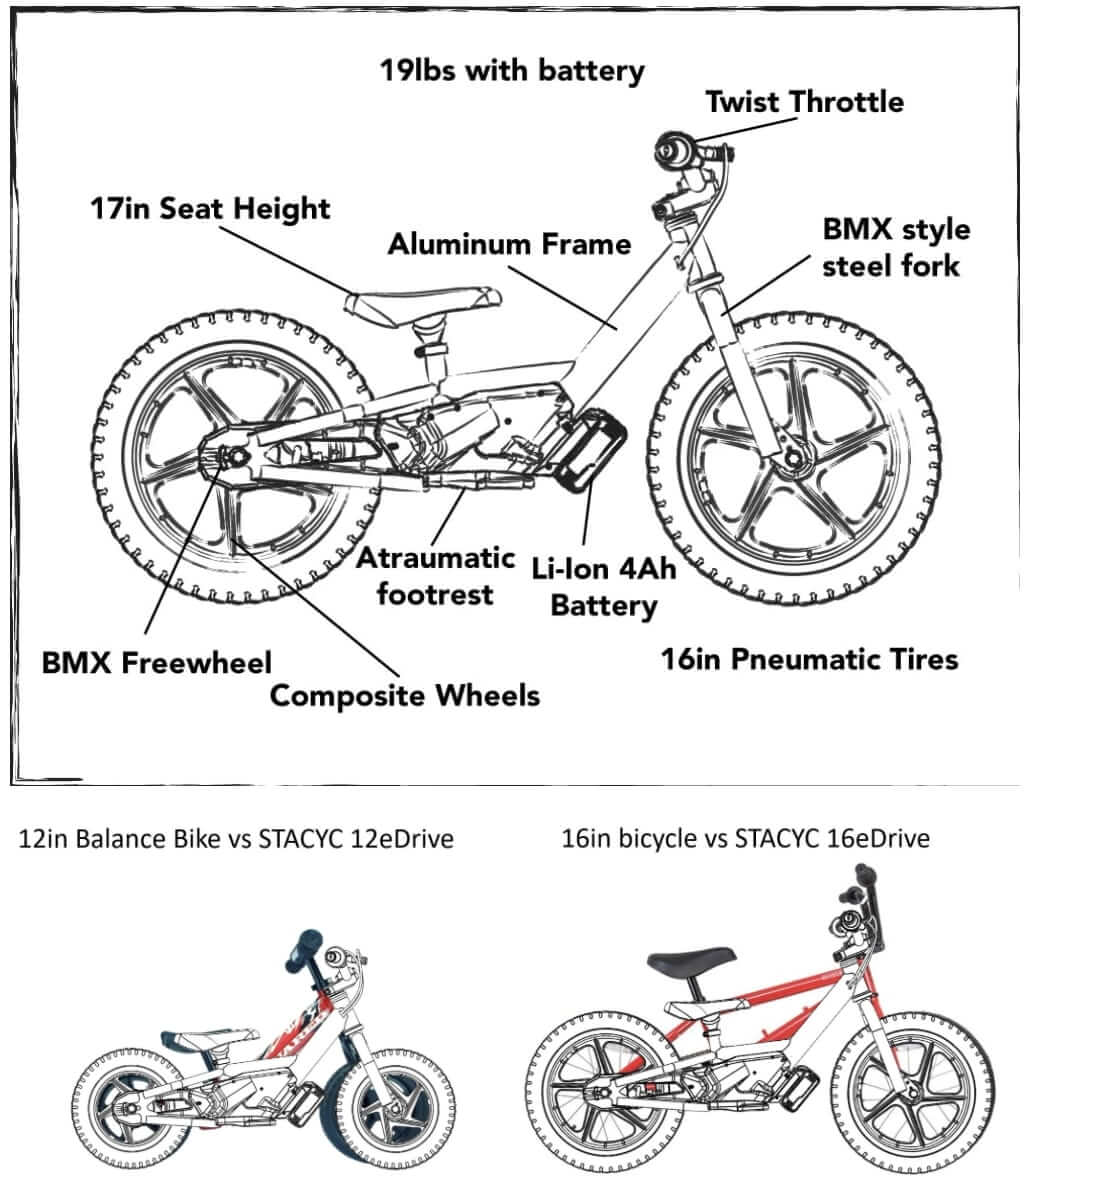 Stacyc bikes comparison